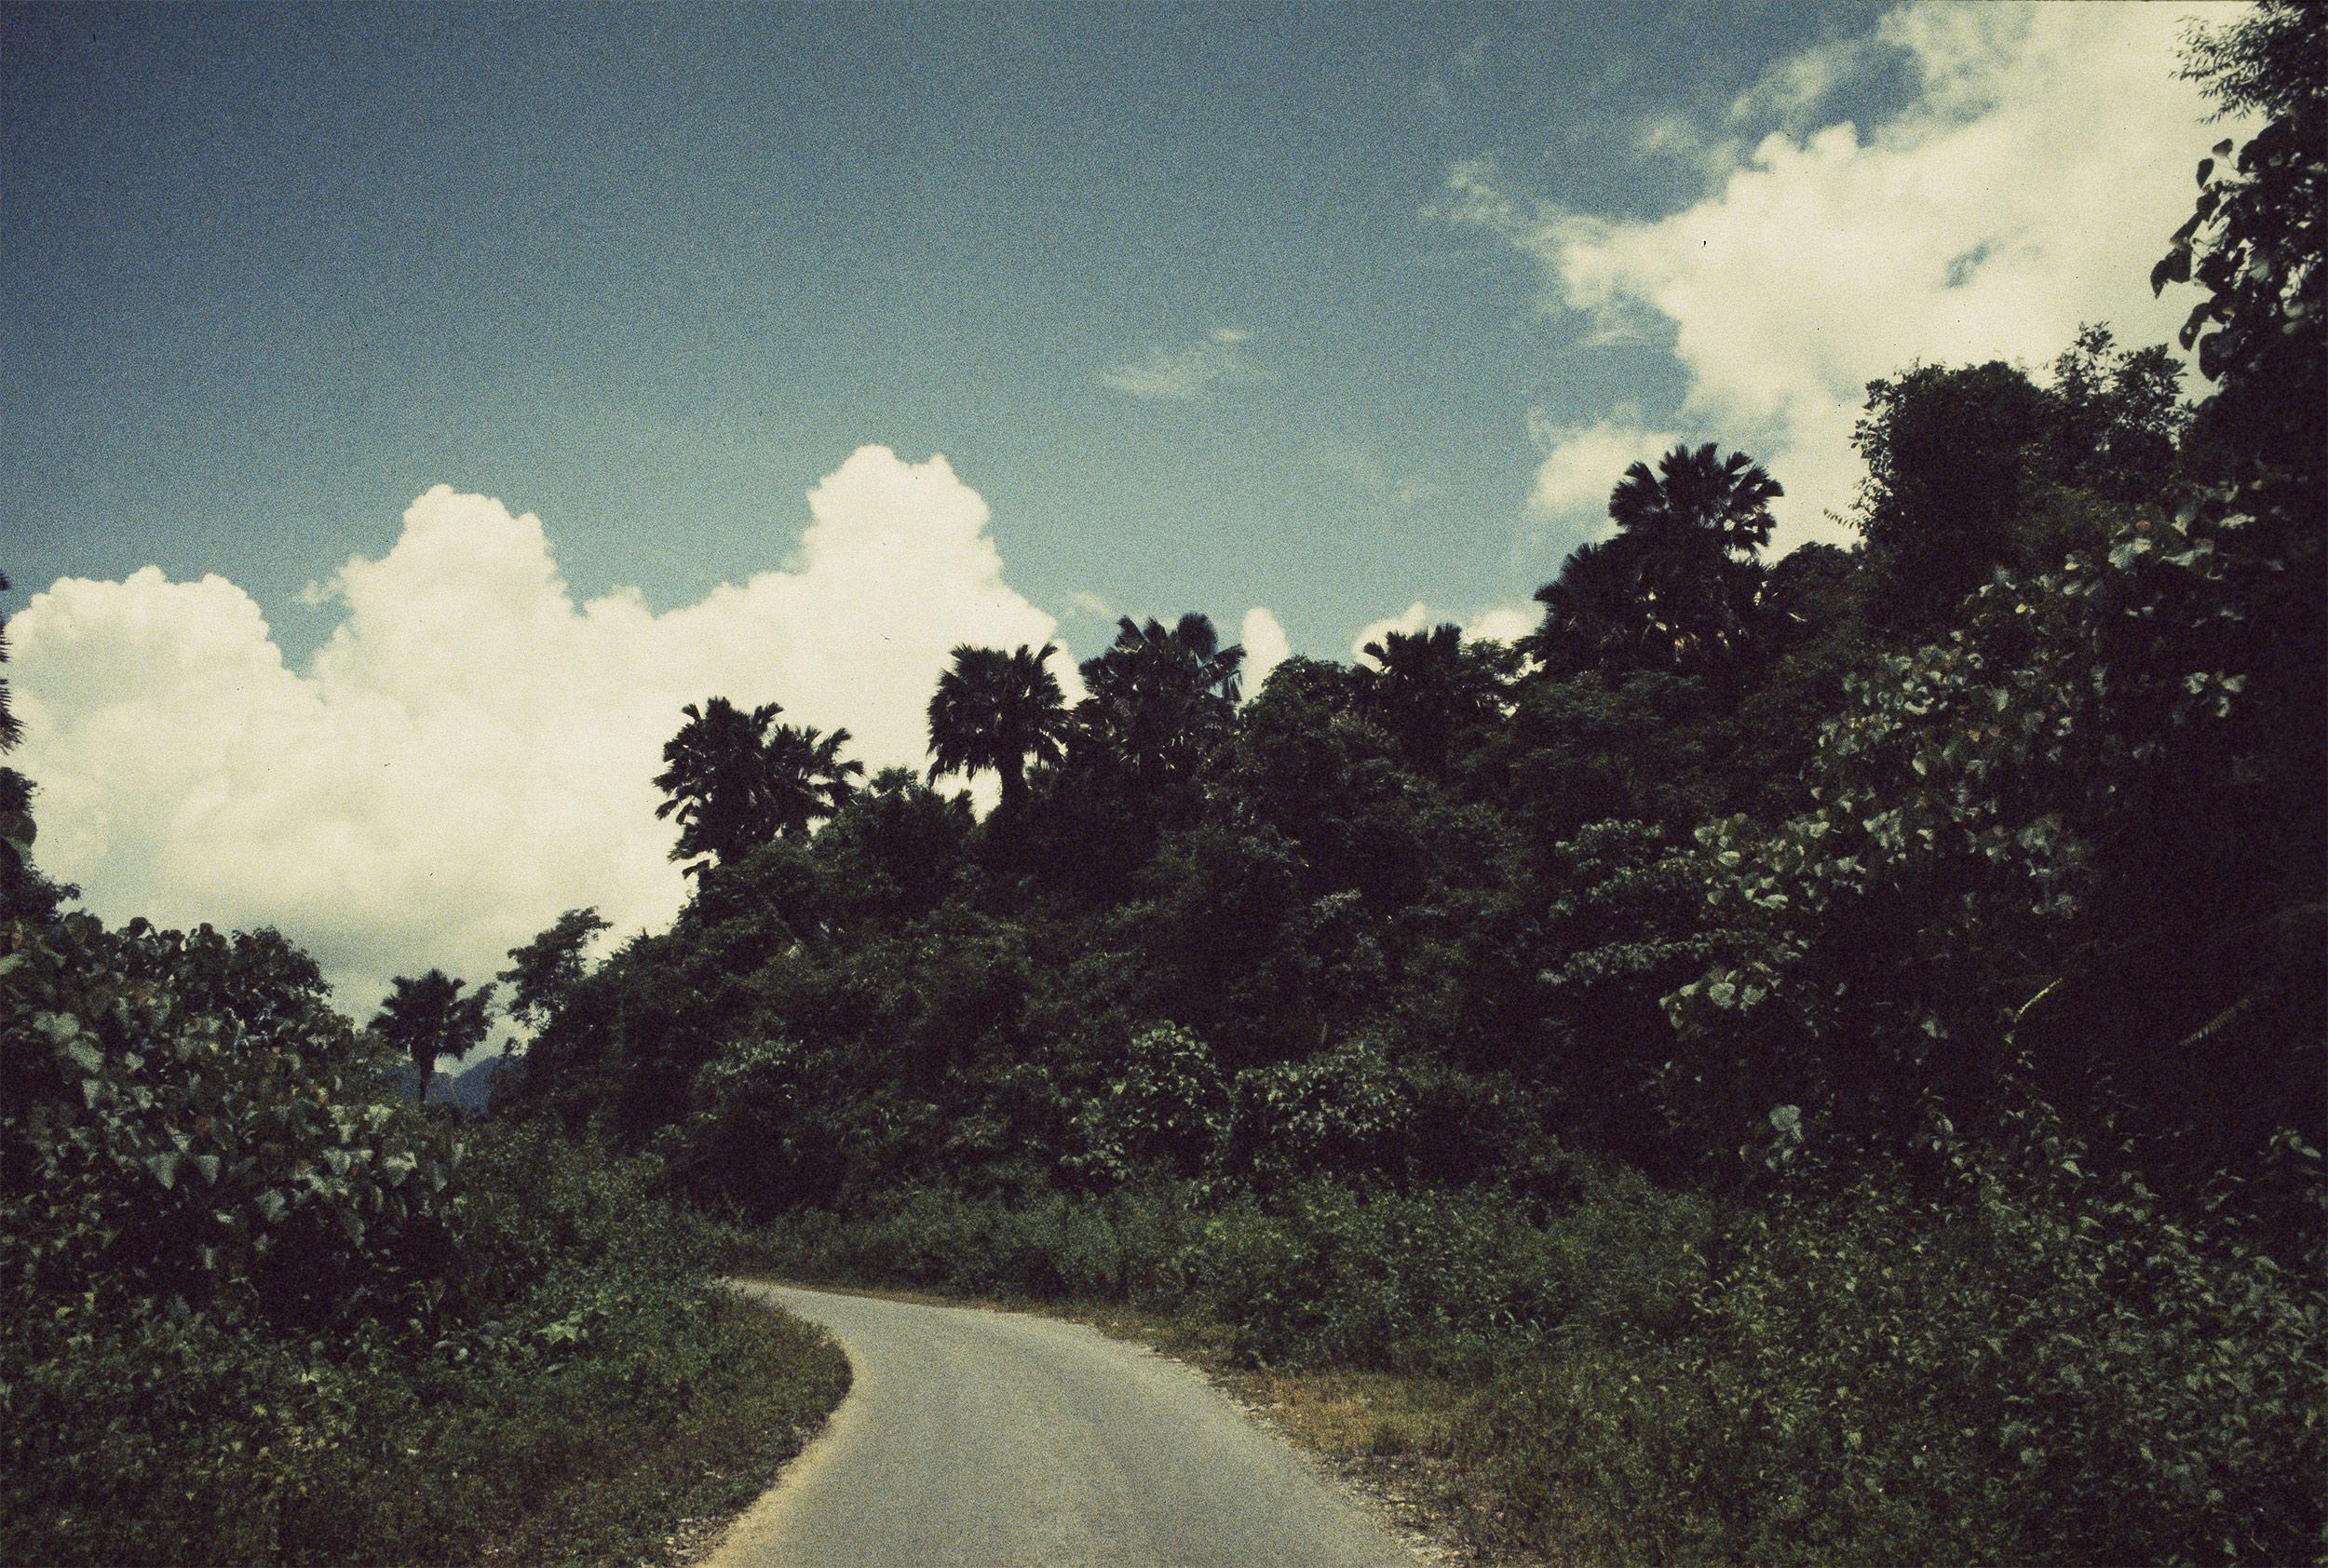 Vietnam-road.jpg